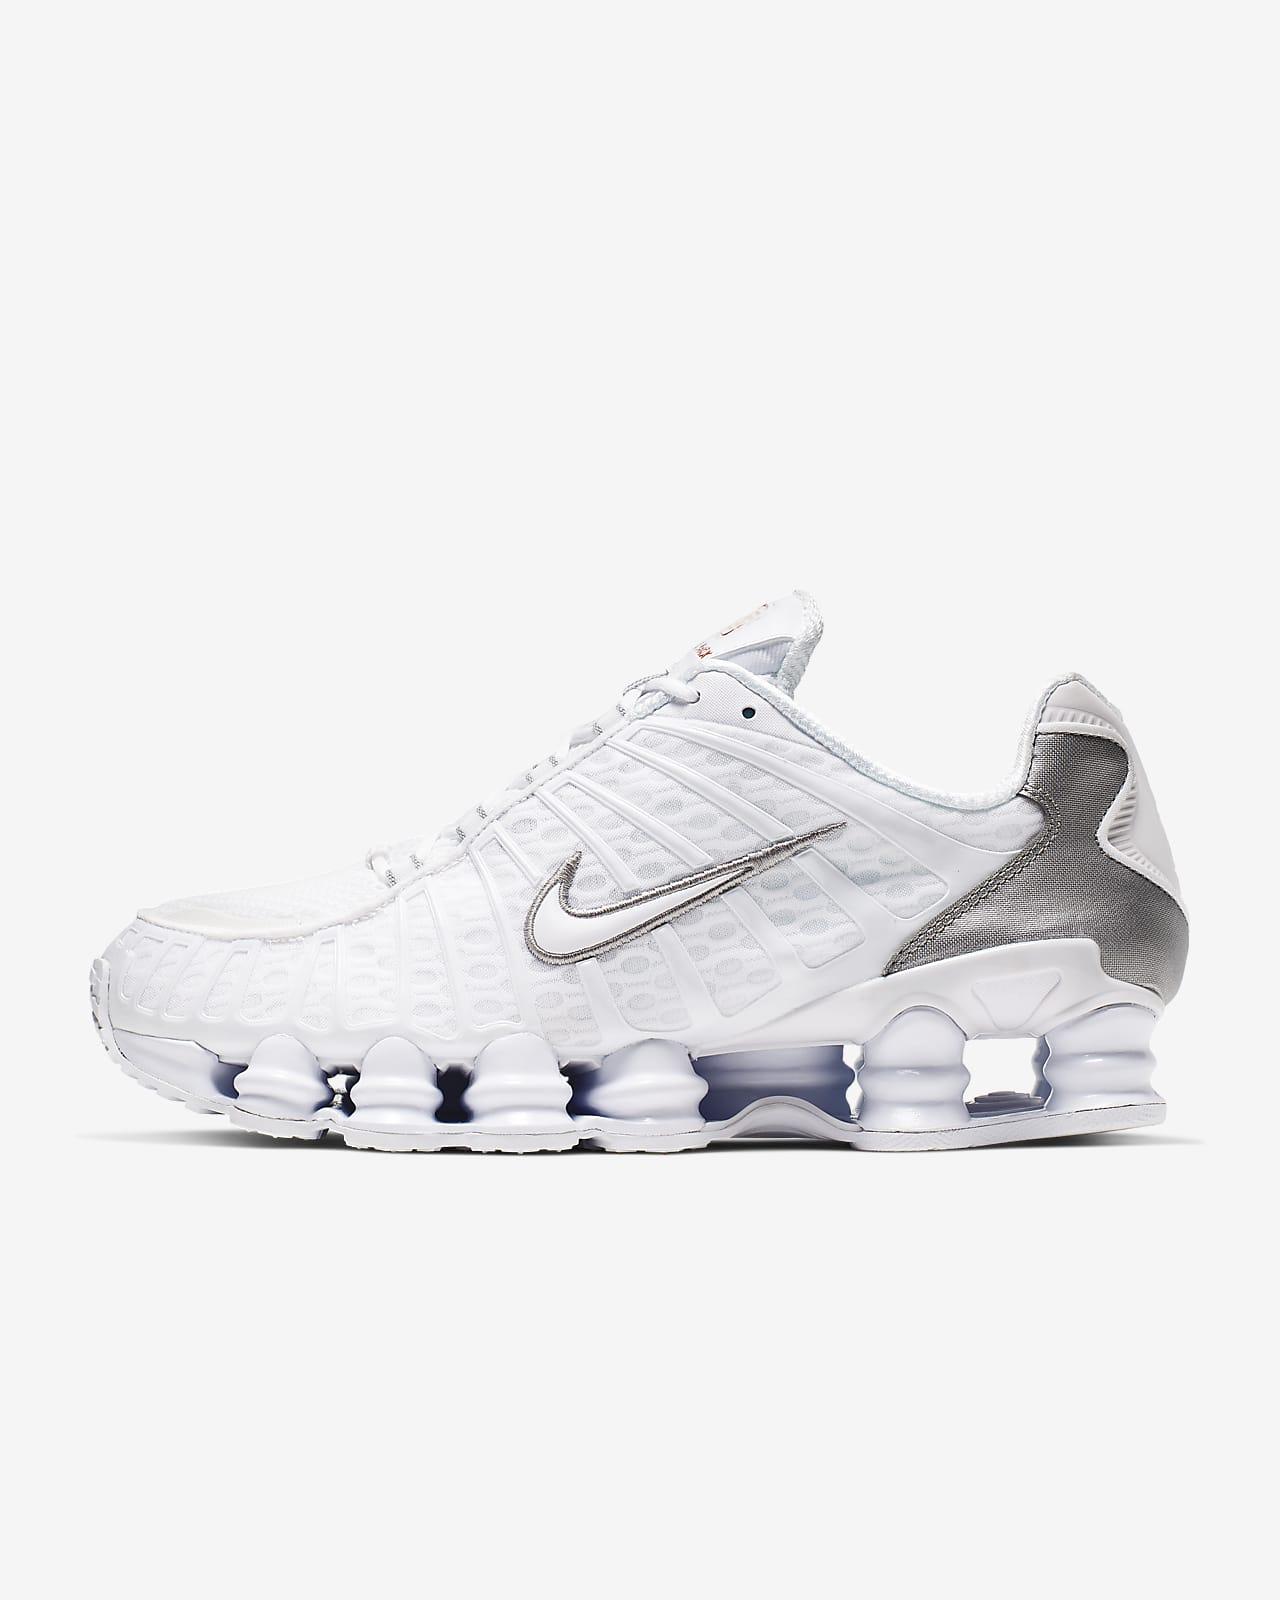 Nike Shox TL Men's Shoe. Nike NL